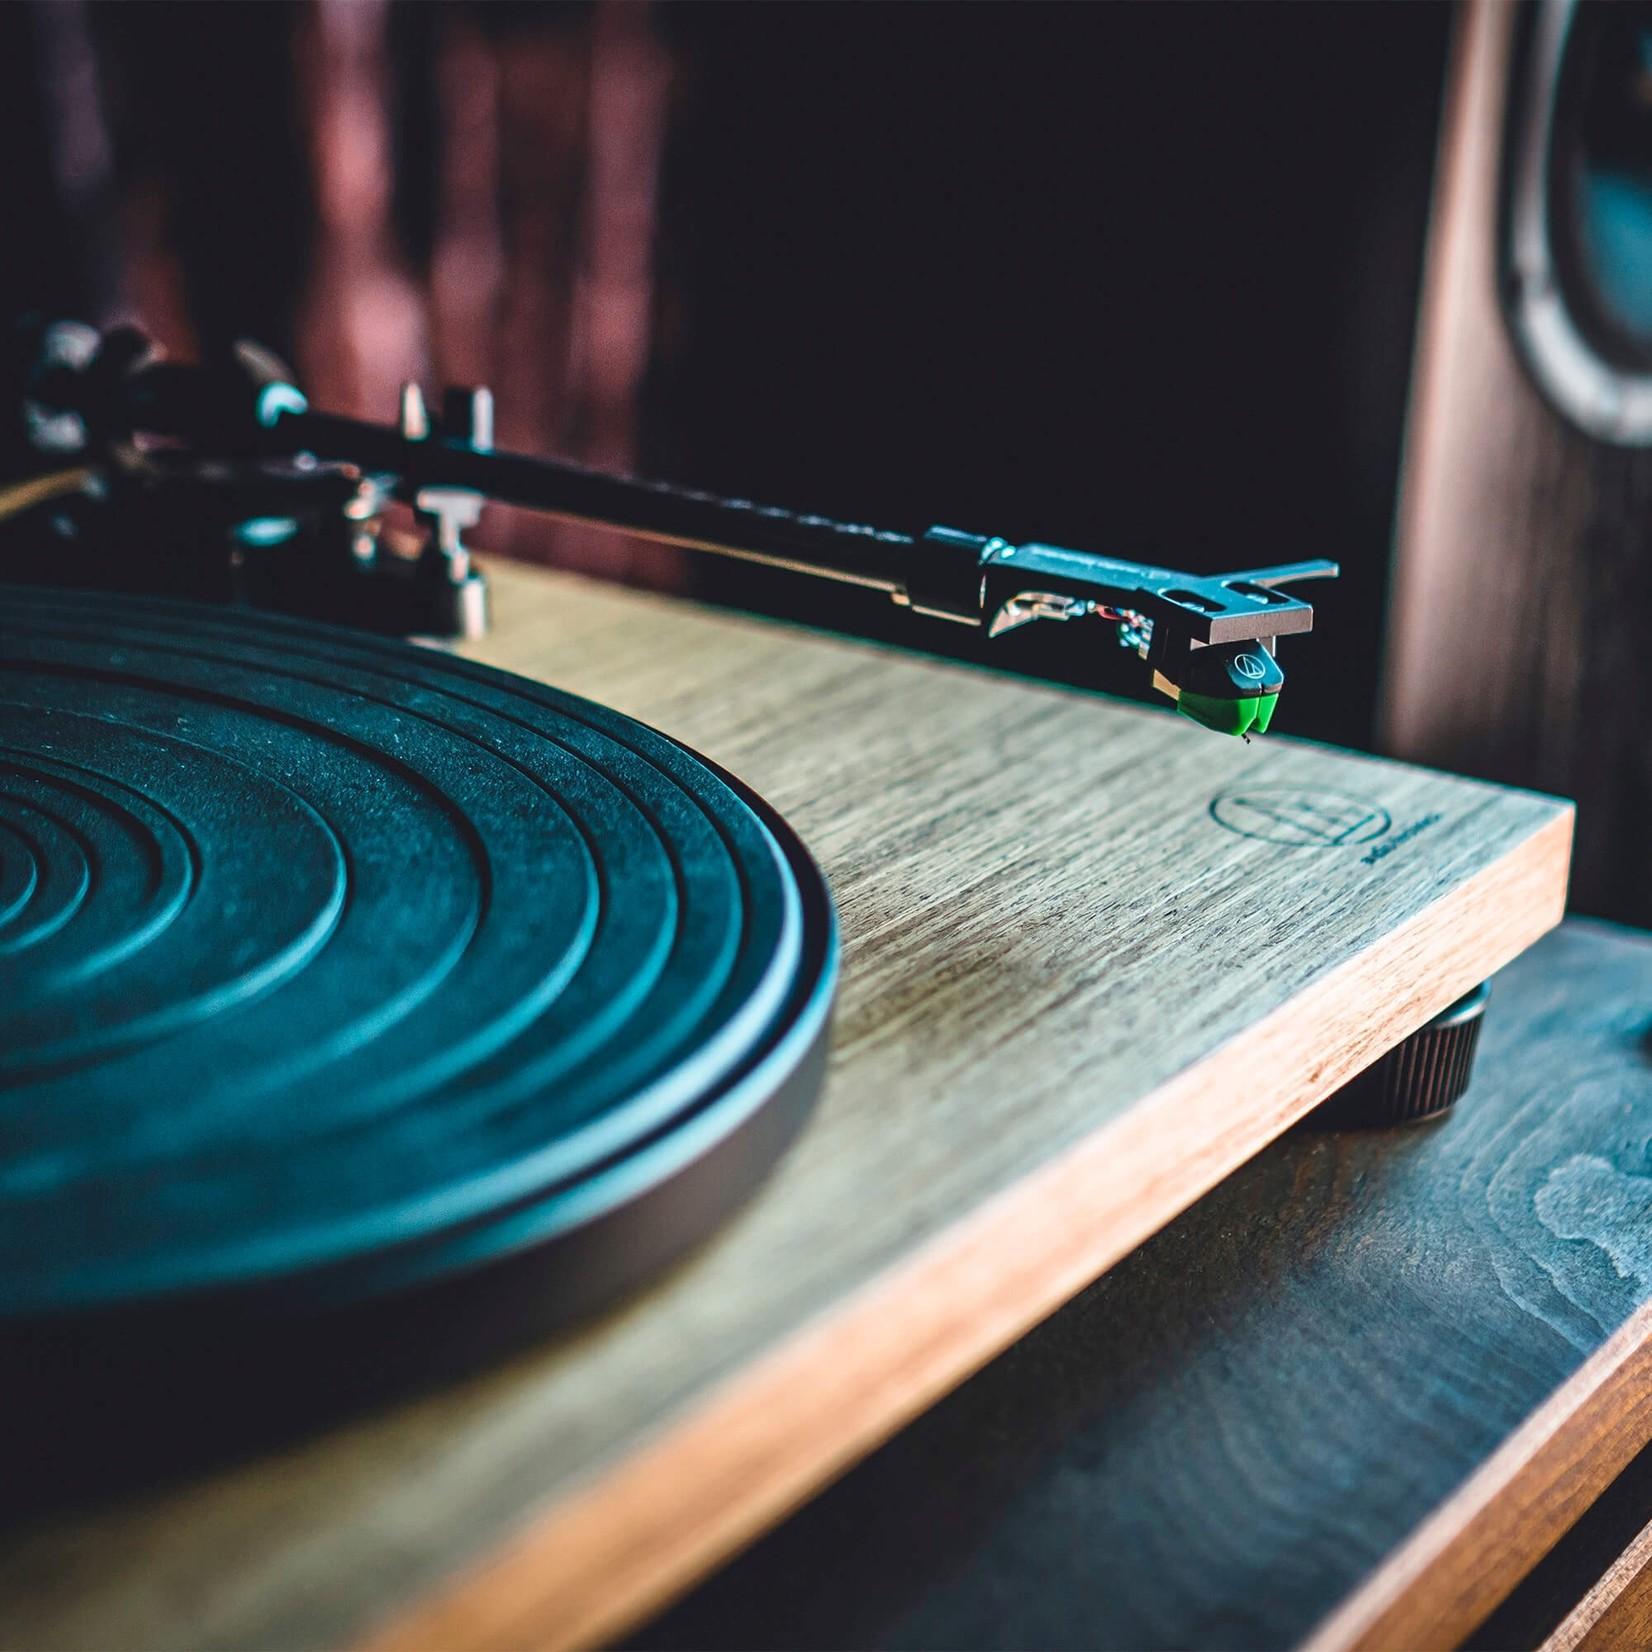 AUDIO-TECHNICA AT-LPW40WN  TURNTABLE